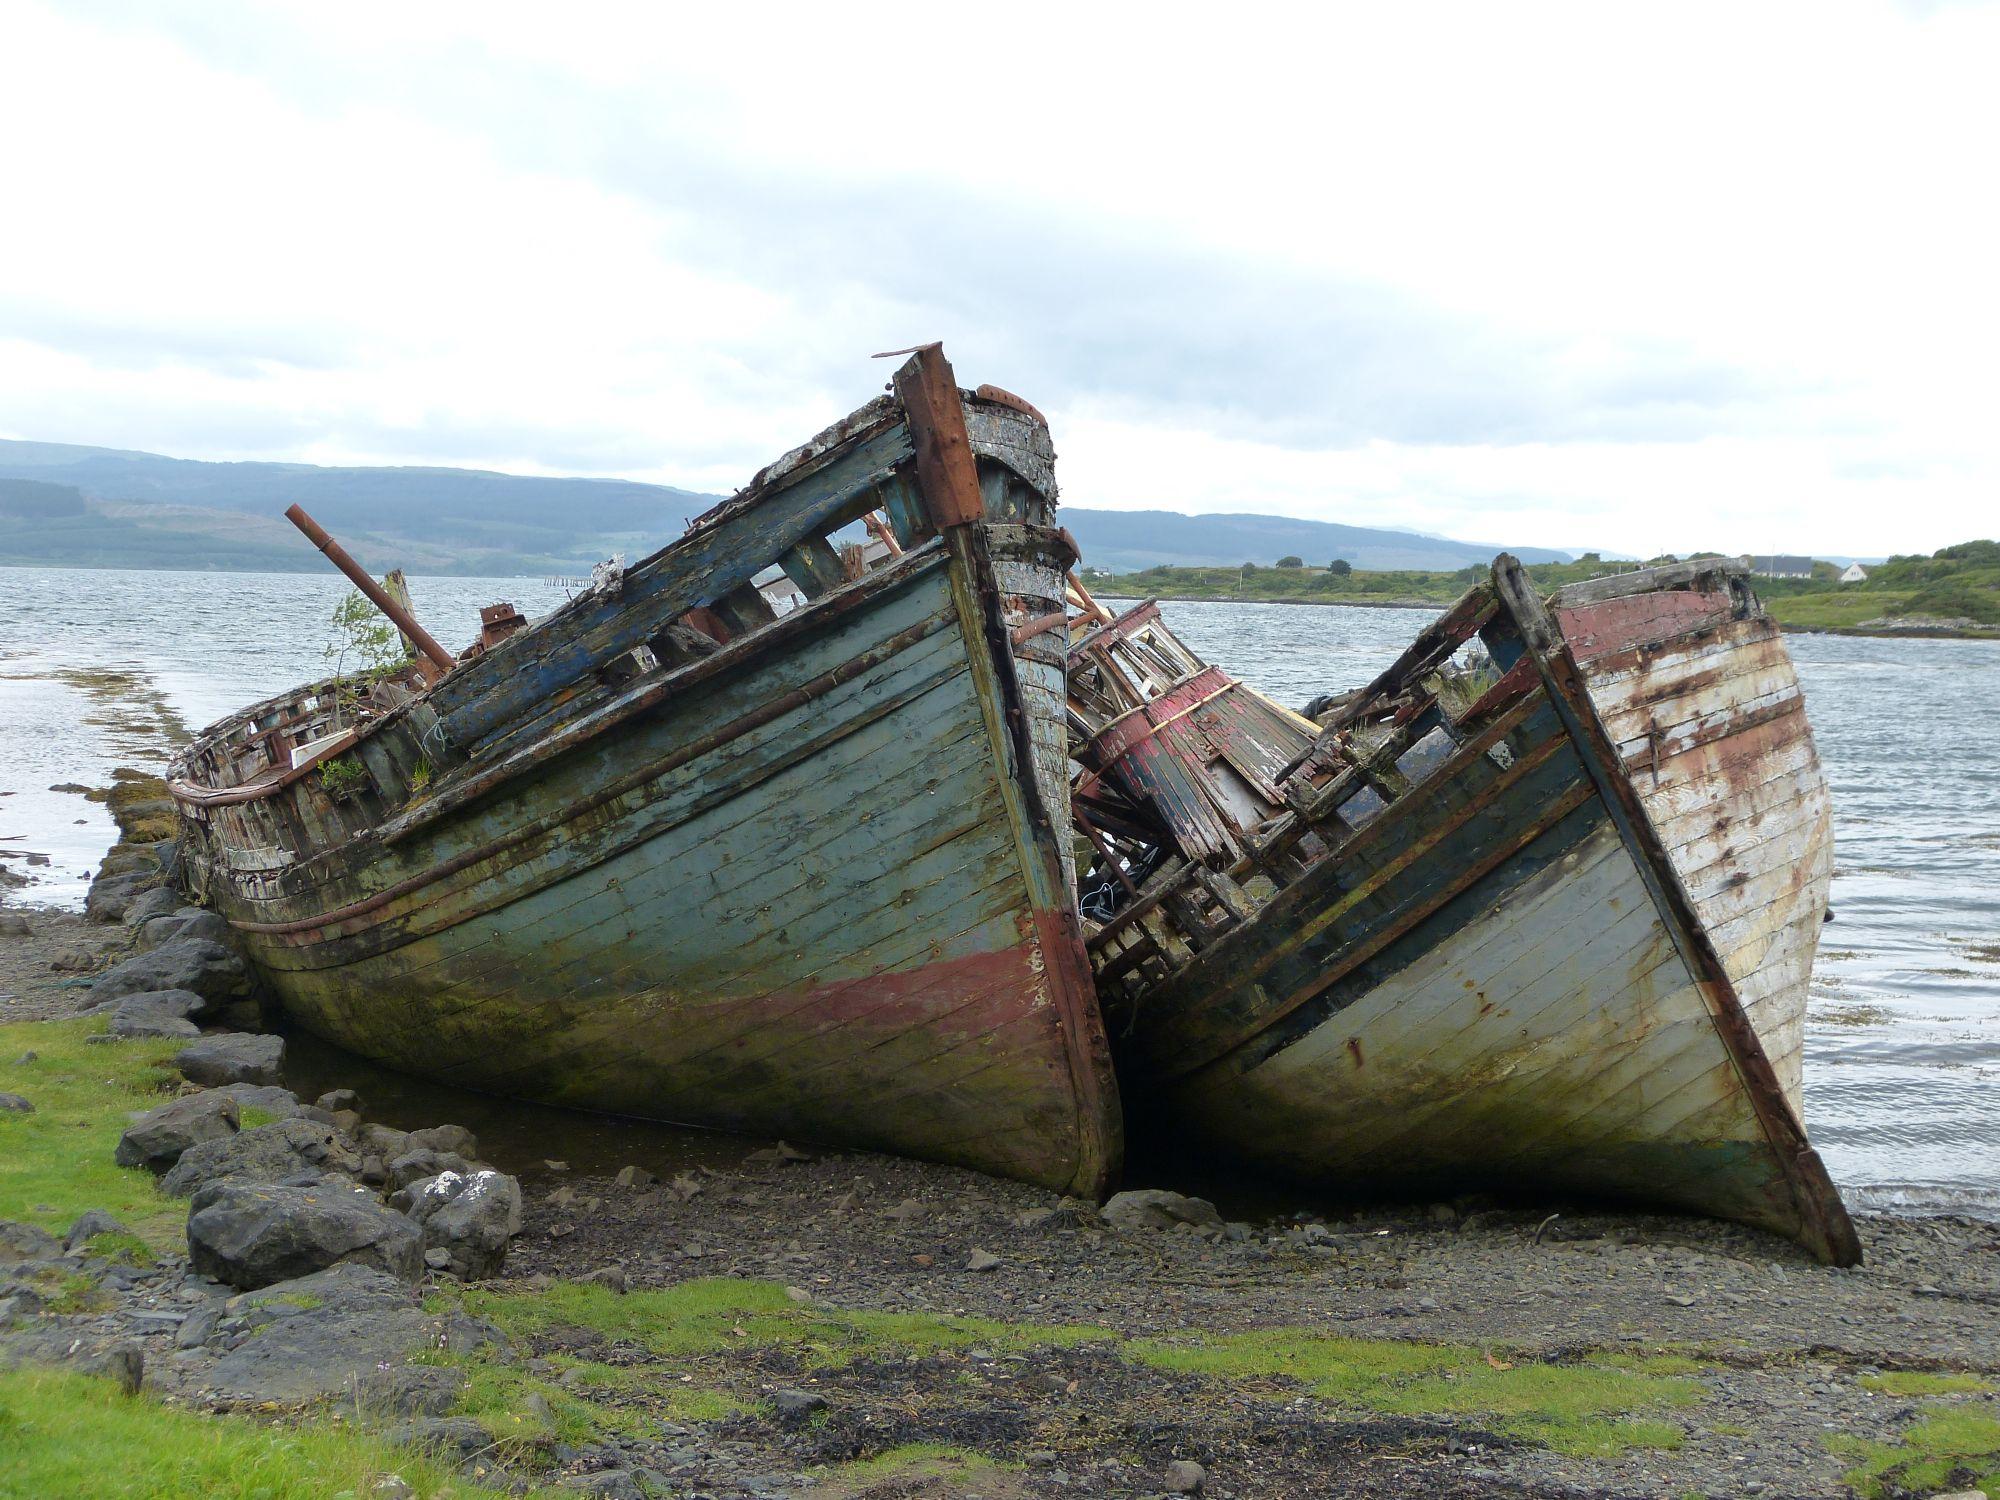 The Boat Graveyard